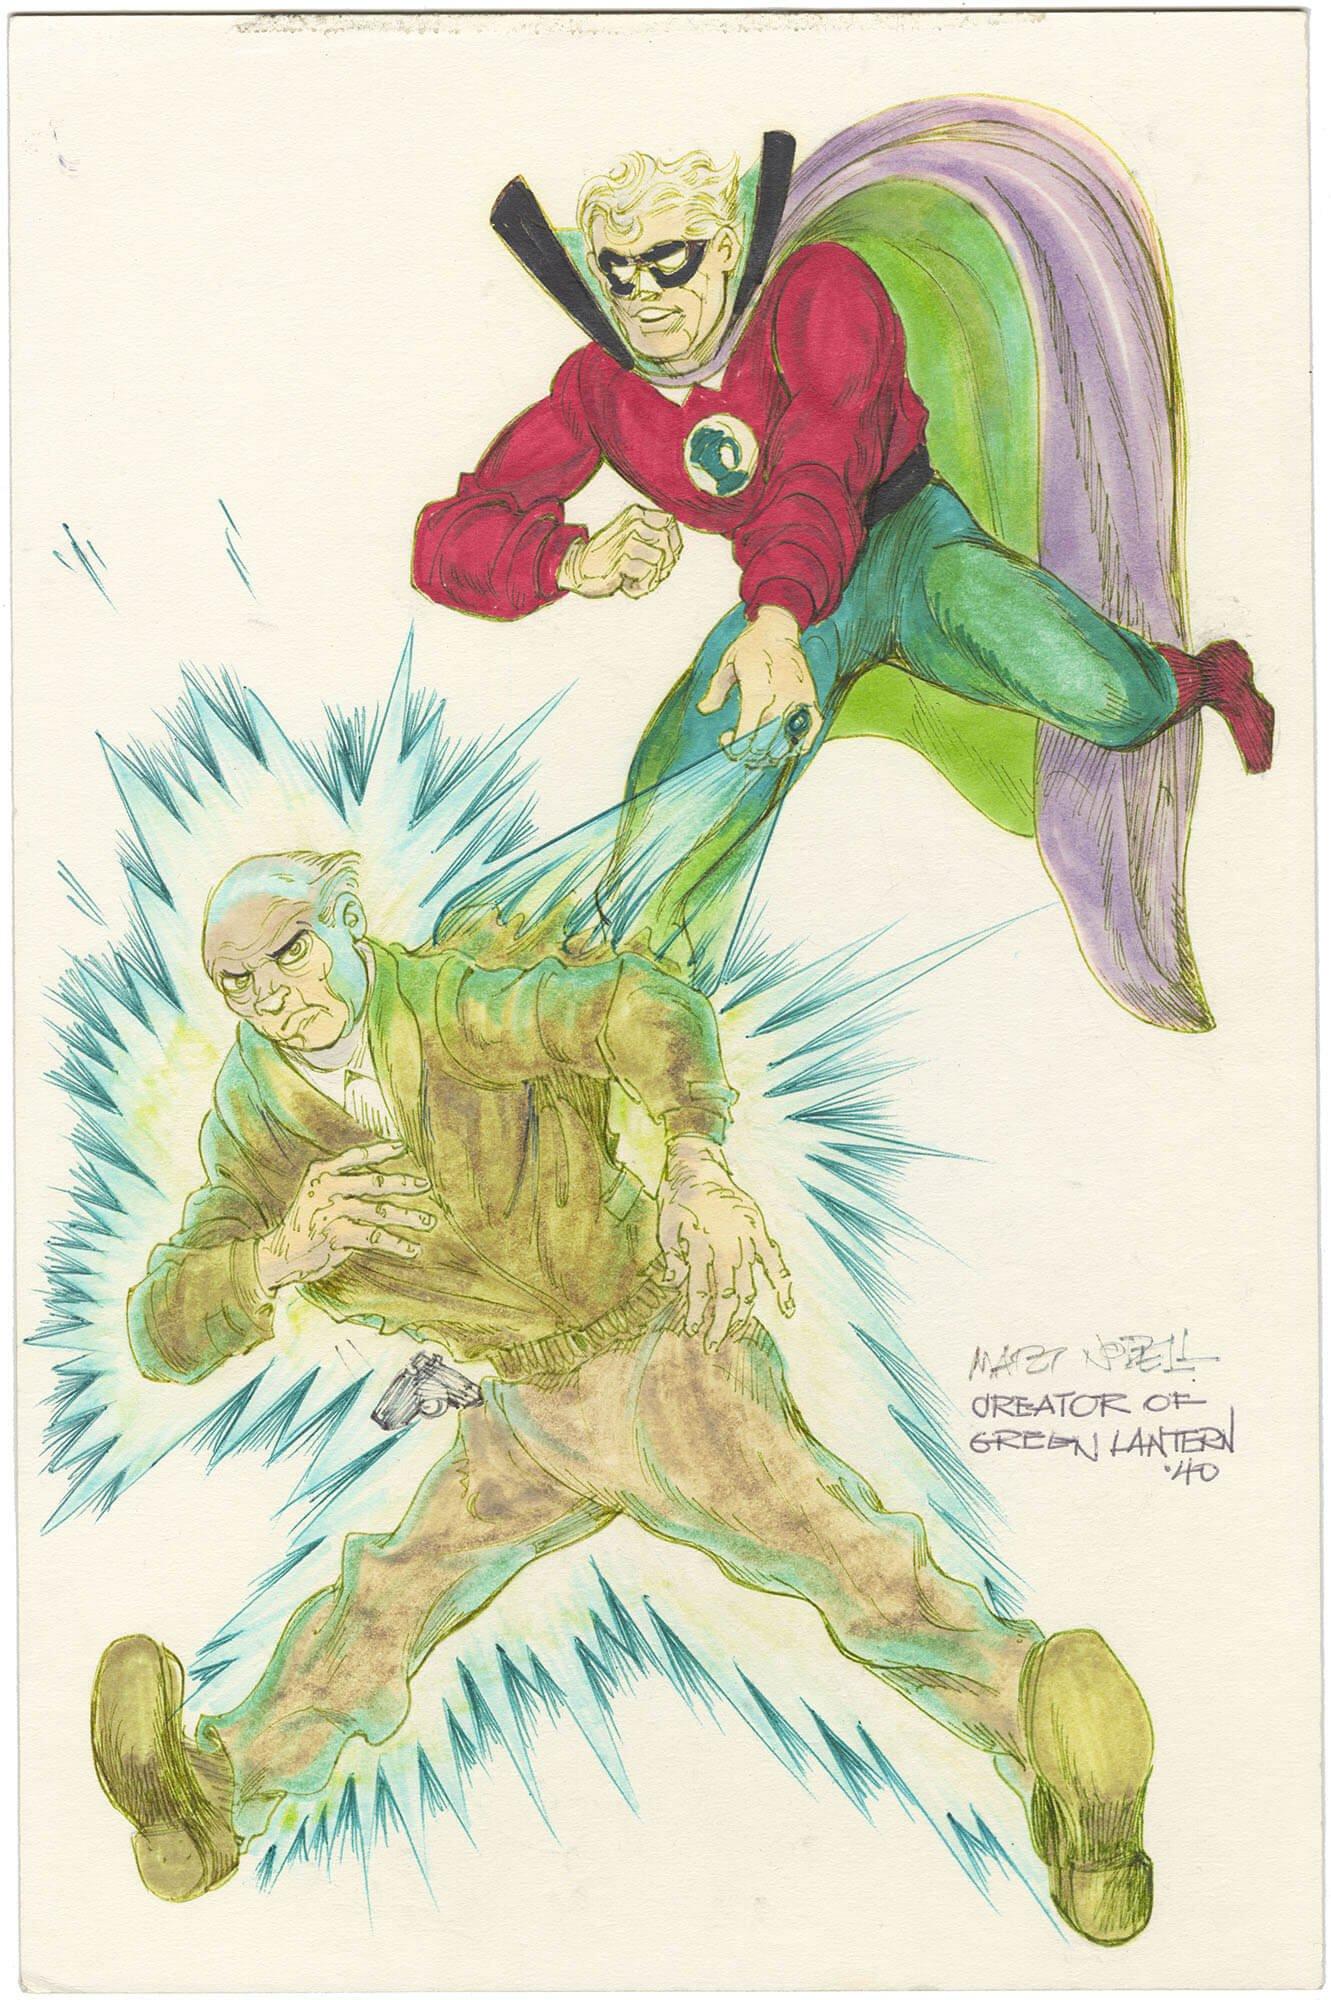 Nodell Green Lantern Commission